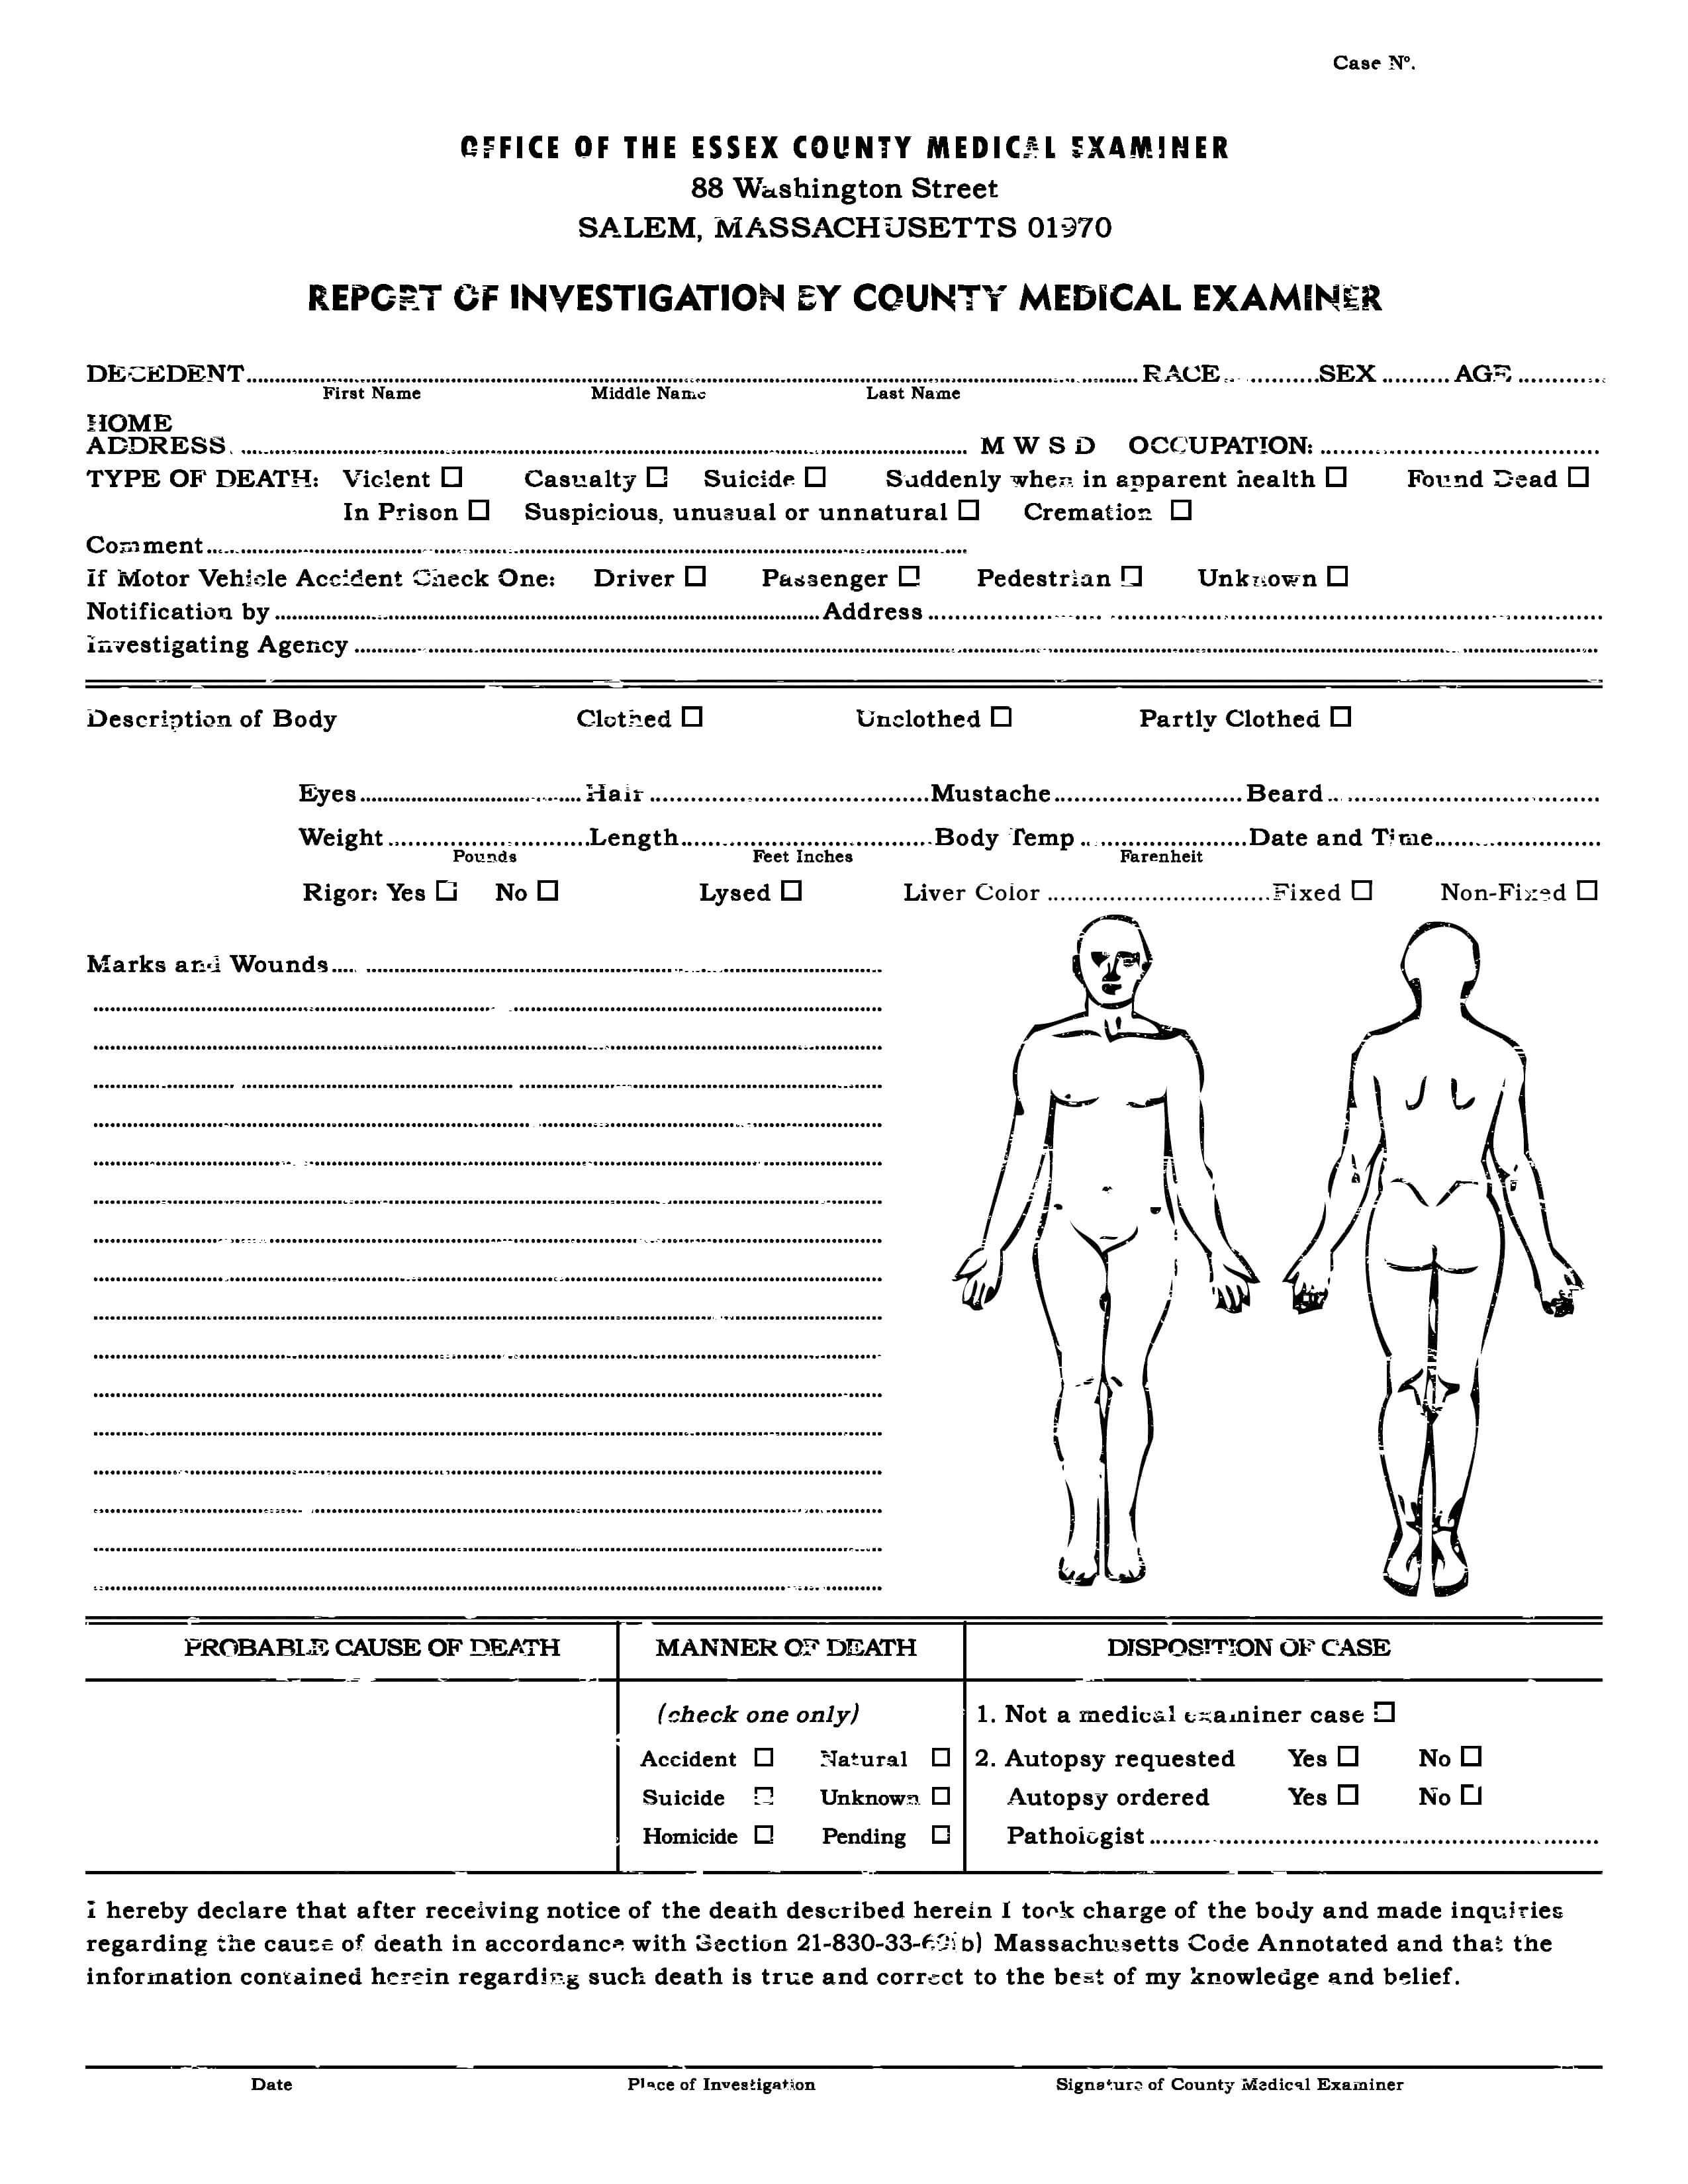 Autopsy Report Template - Atlantaauctionco Inside Blank Autopsy Report Template